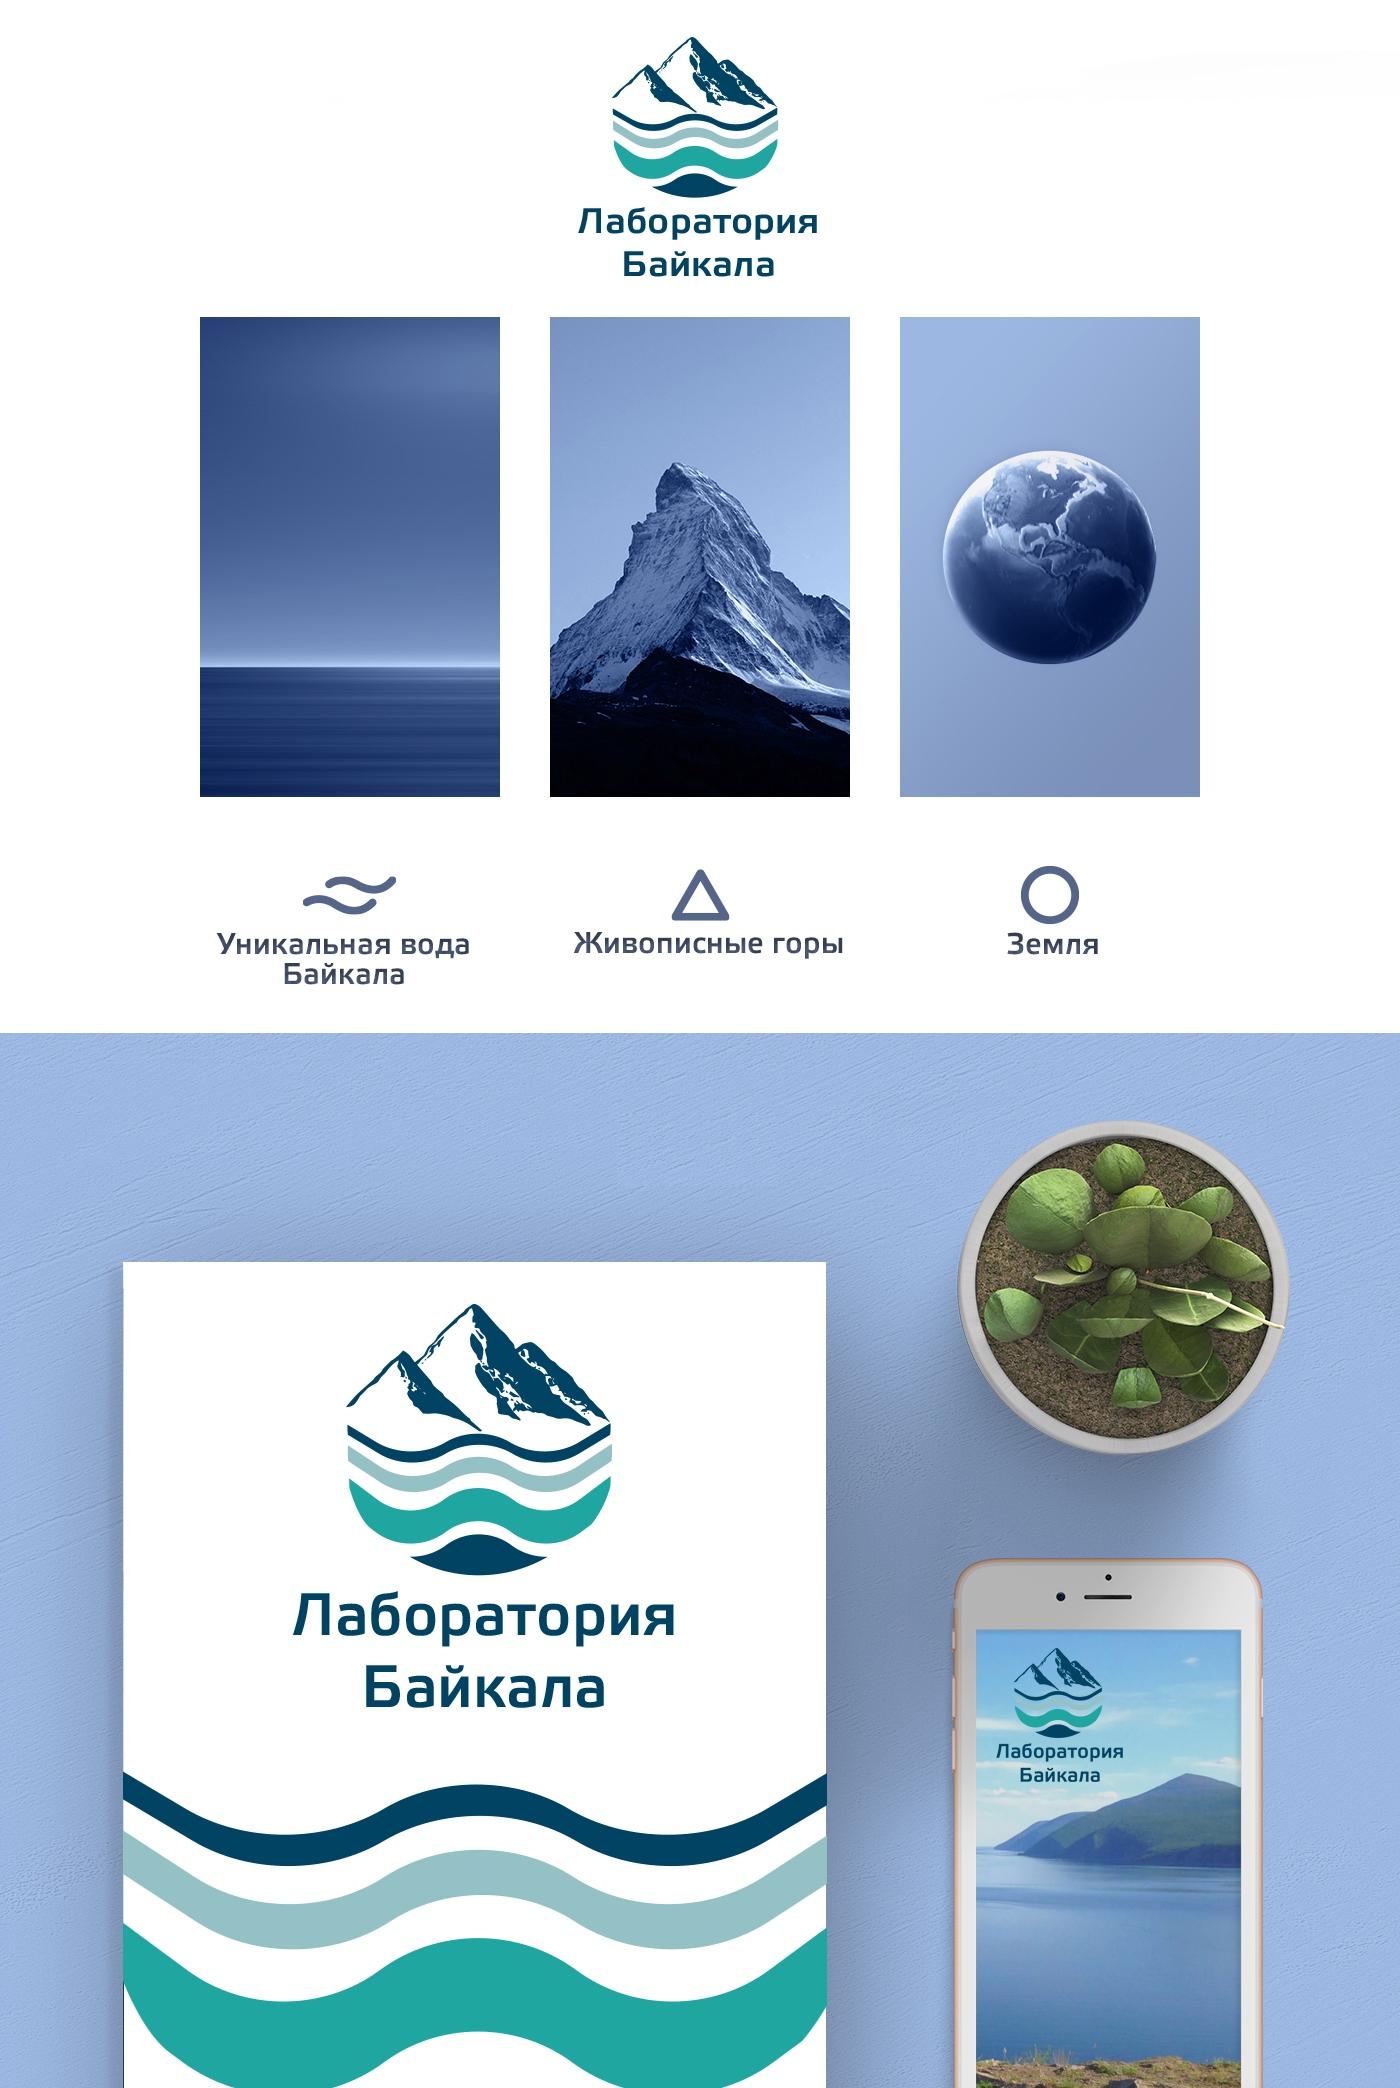 Разработка логотипа торговой марки фото f_4935971b80a0ac45.jpg